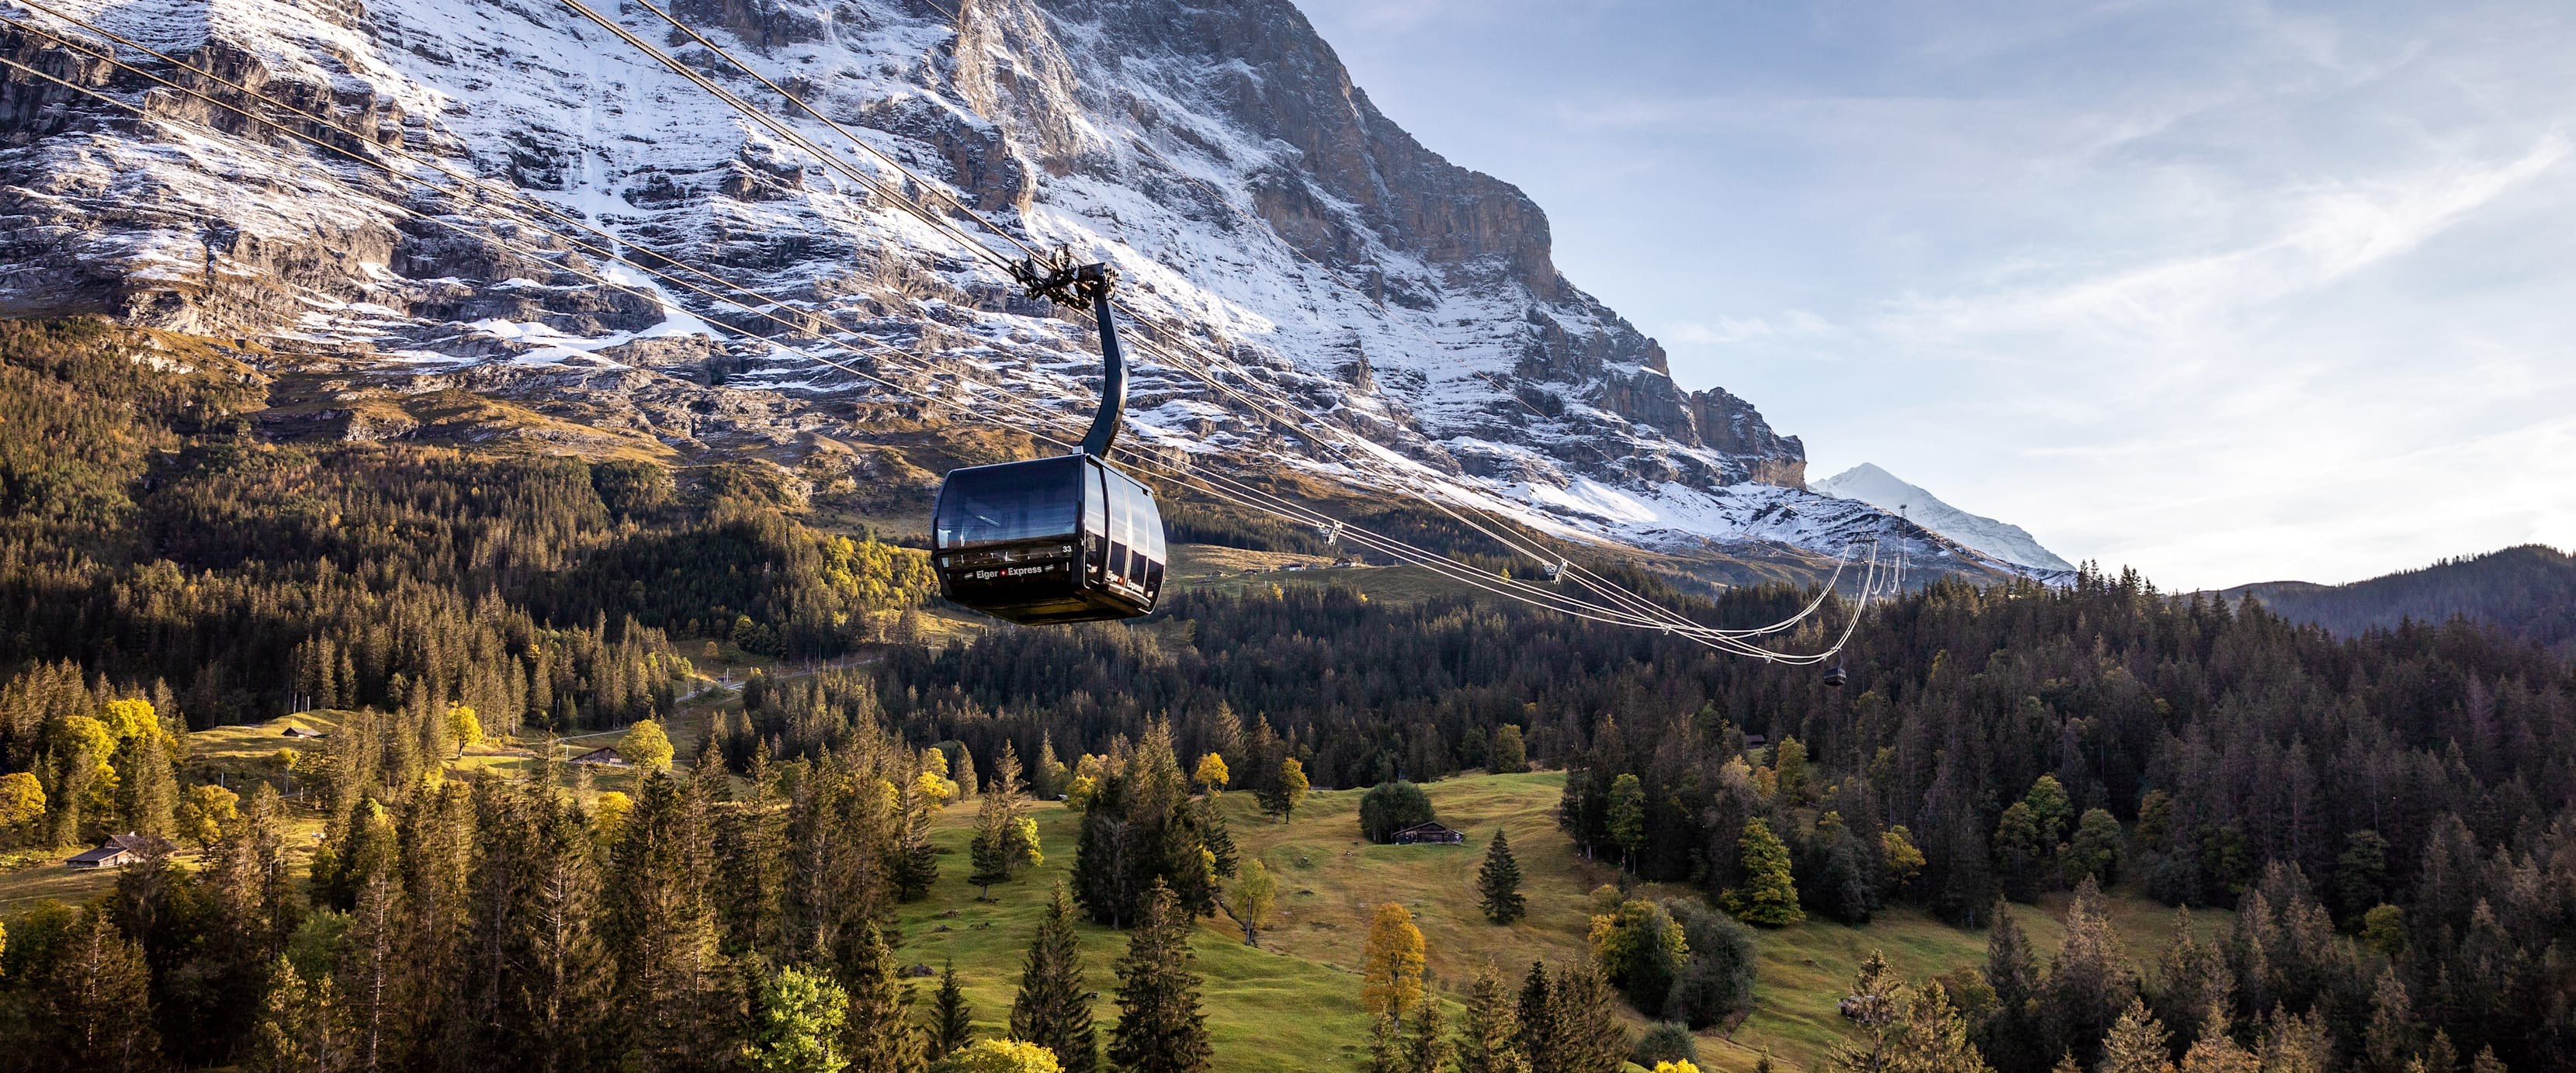 Abend-Morgenstimmung, Bahnen-Maschinen, Berge, Eiger, Eiger-Express, Herbst, Silberhorn, Sommer, V-Bahn, Verhältnisse